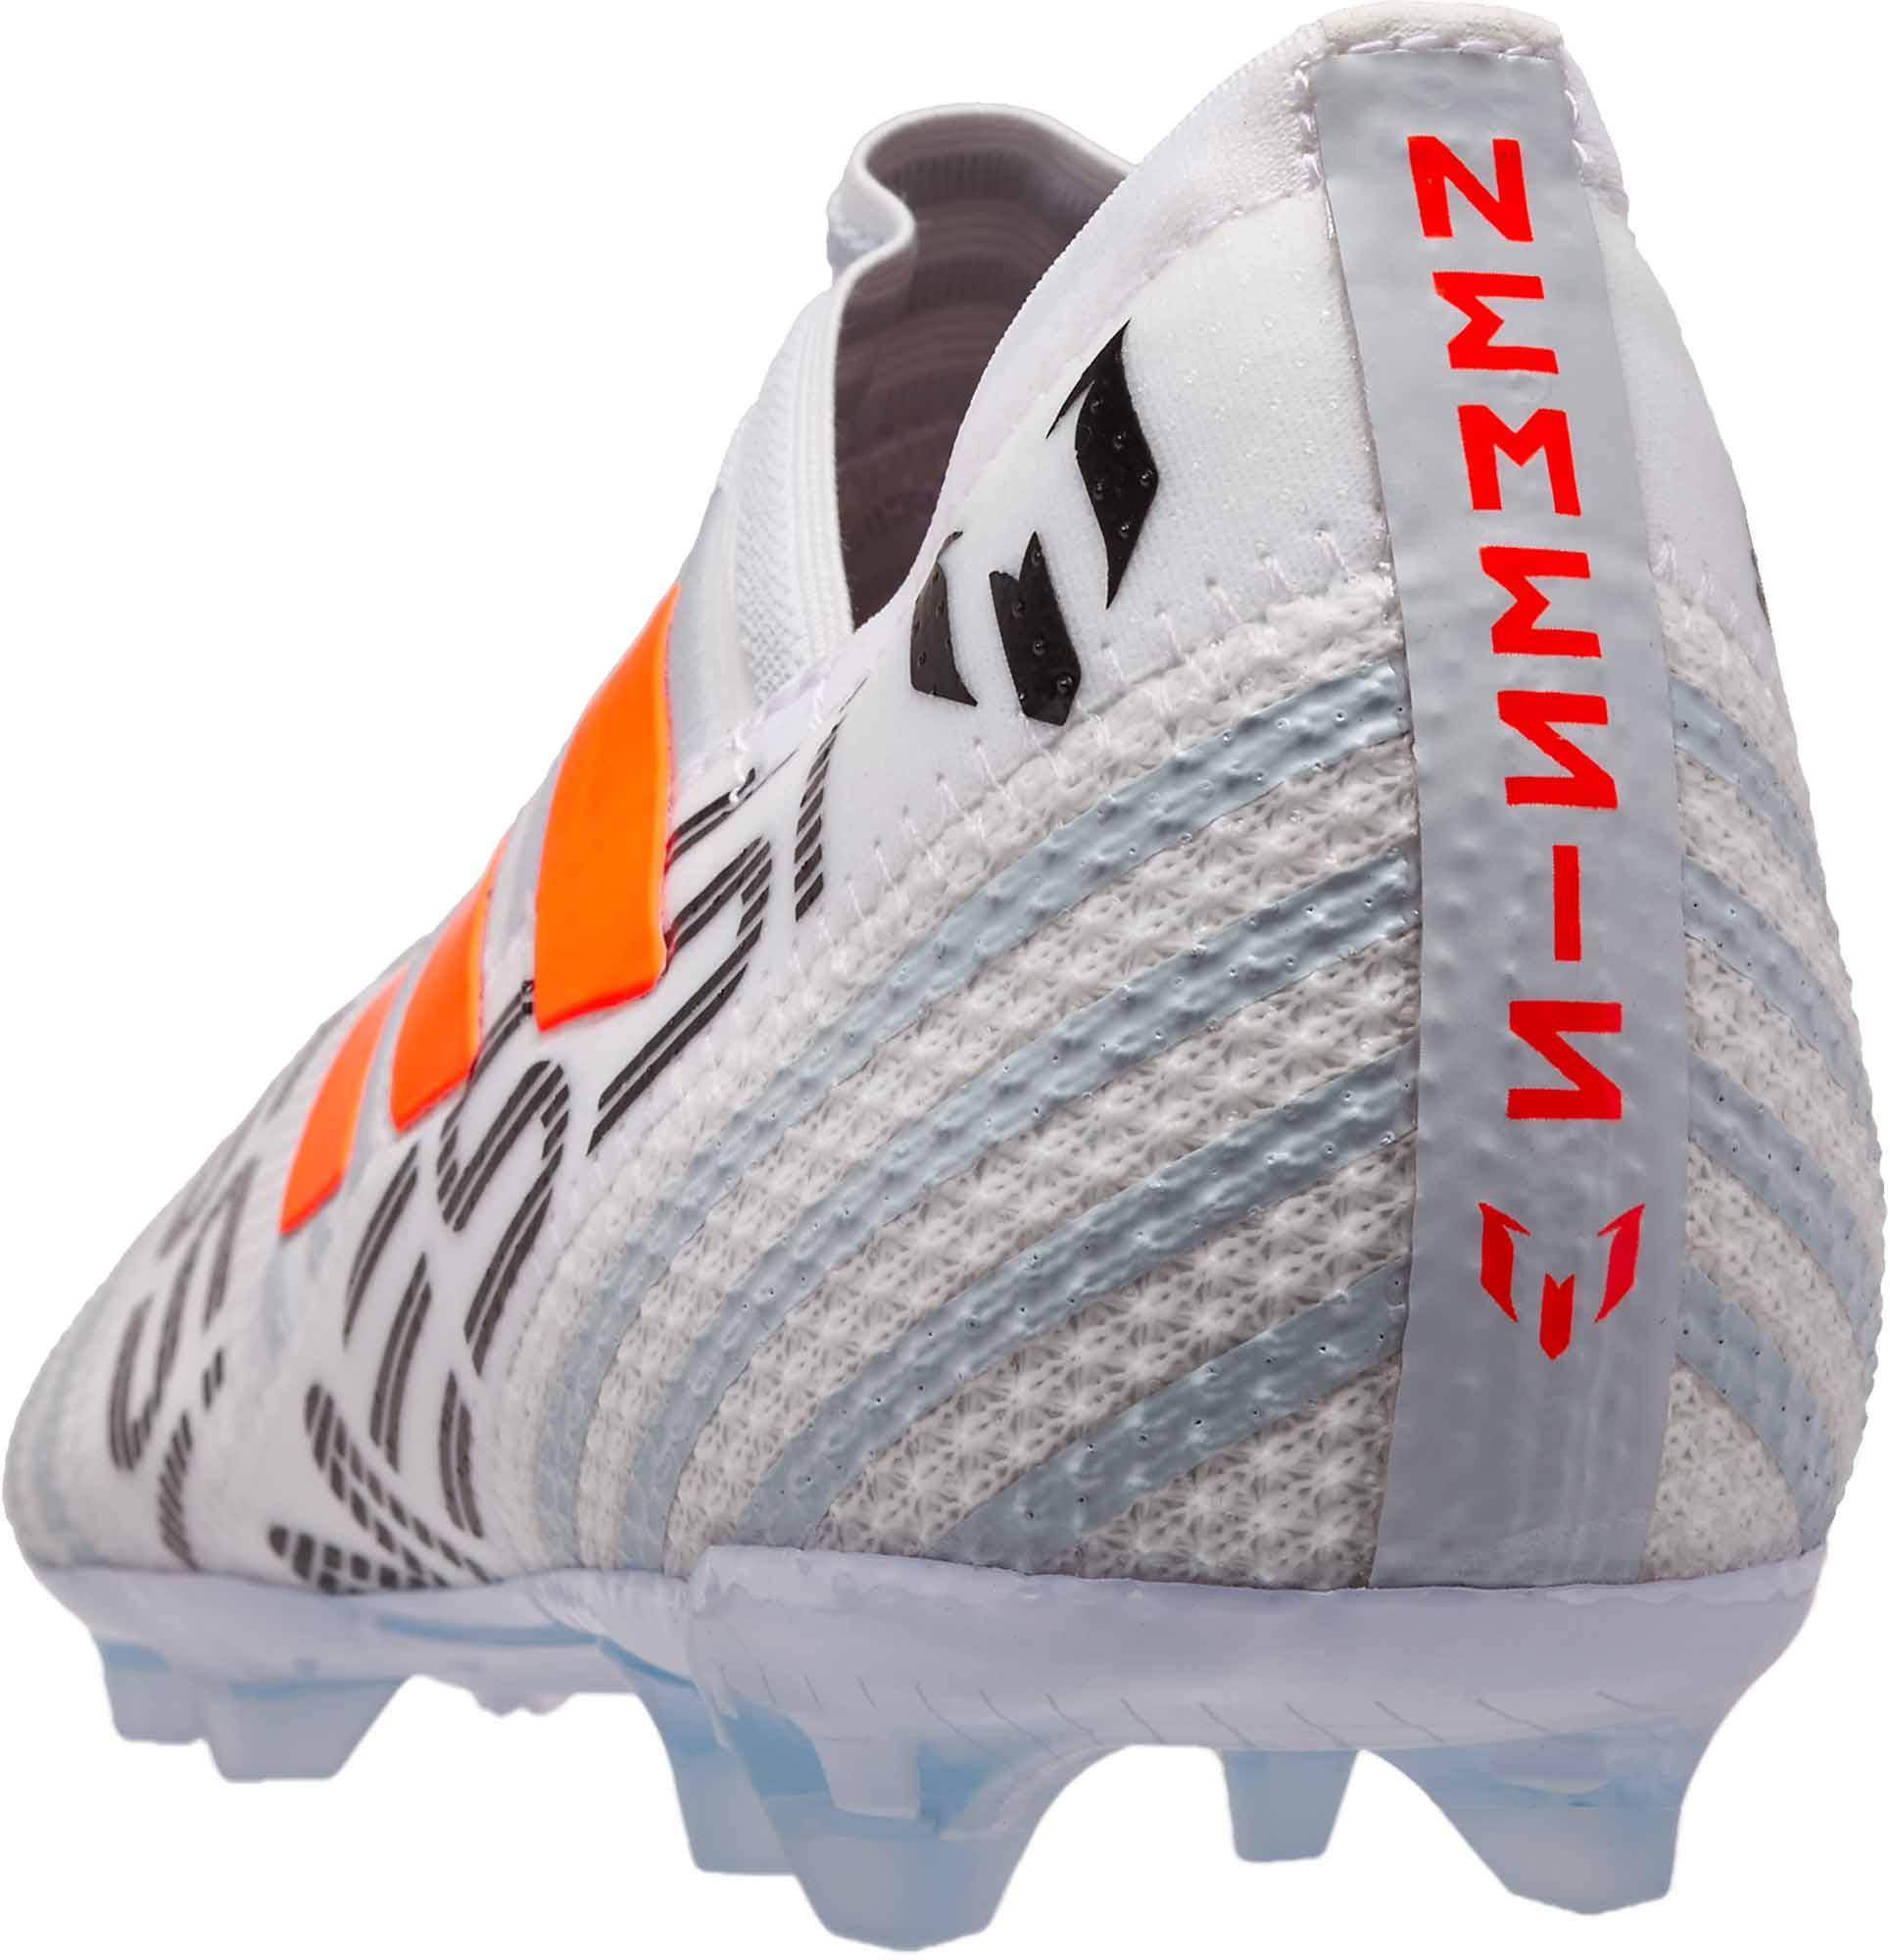 4b9fc526657d adidas Kids Nemeziz Messi 17 360Agility FG – White Solar Orange